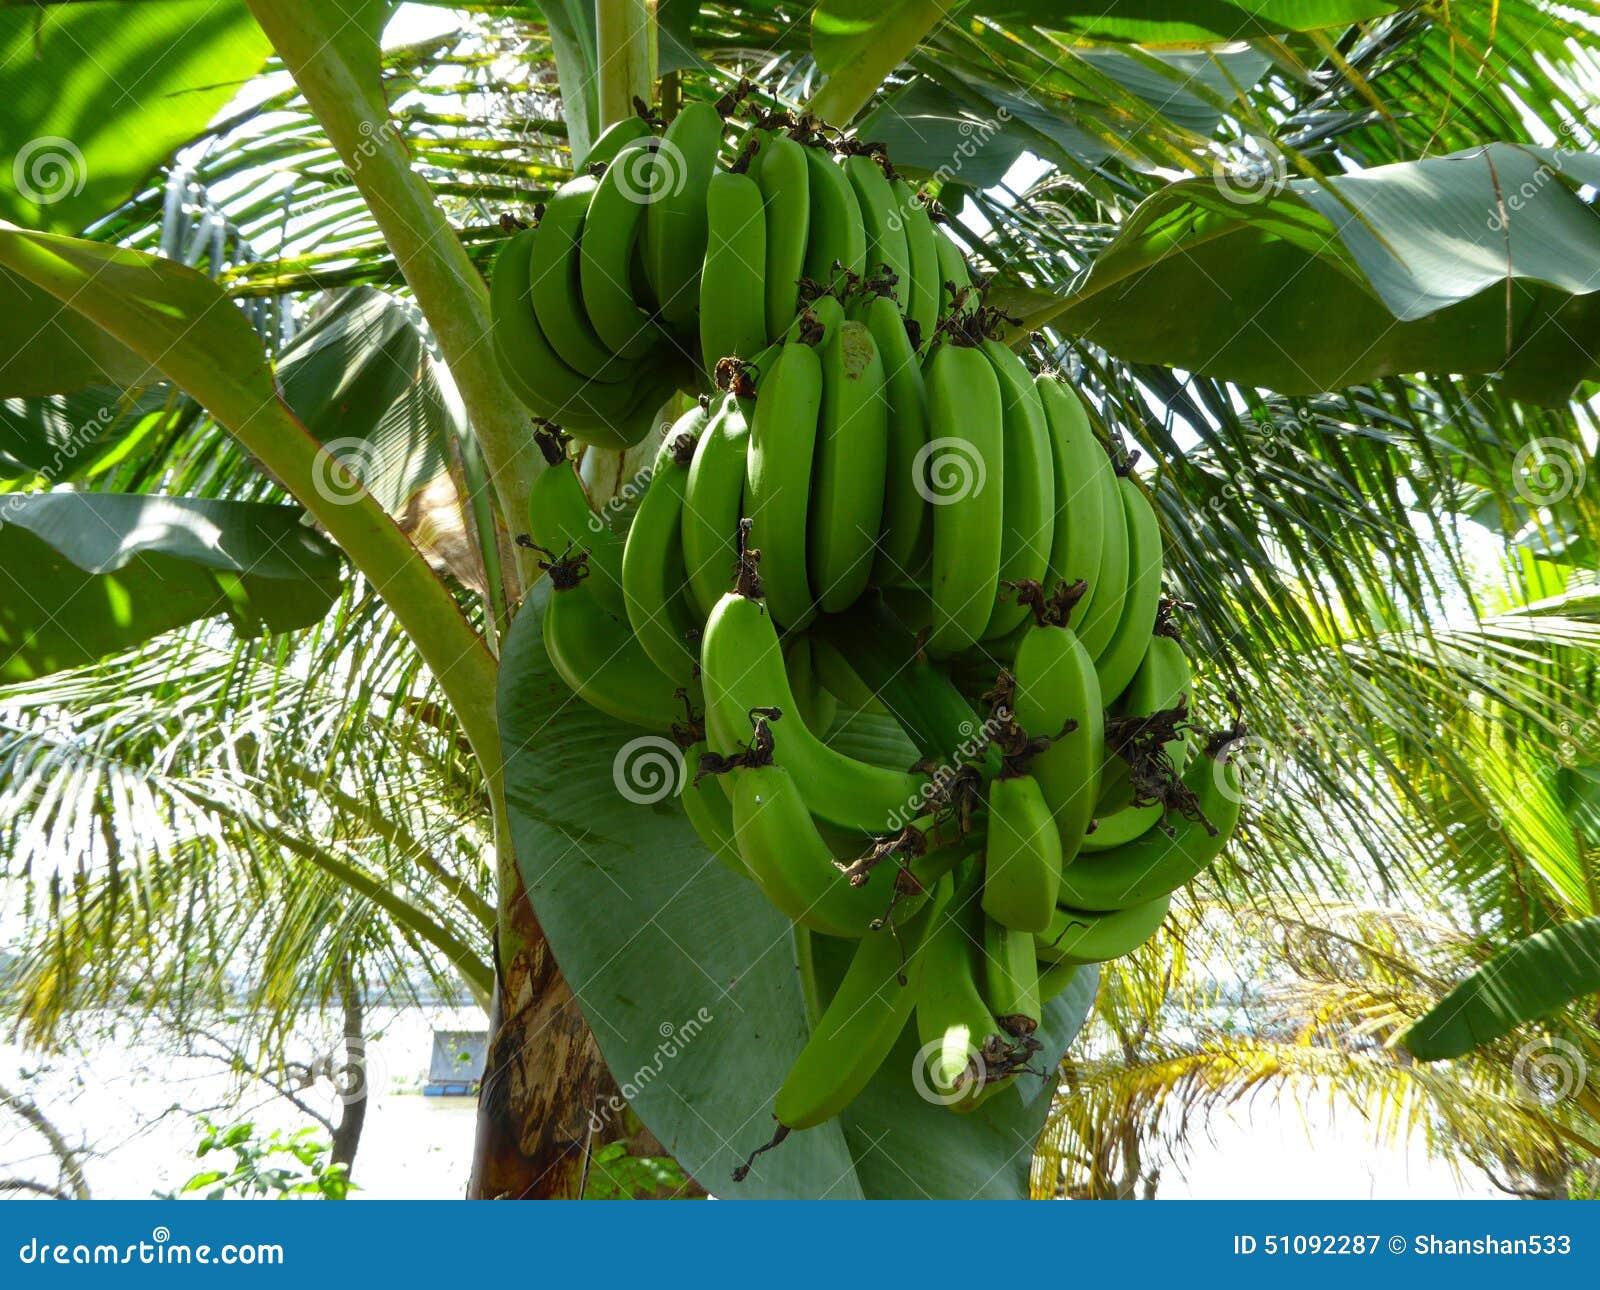 Bunches Of Green Bananas On A Banana Tree Stock Photo ...